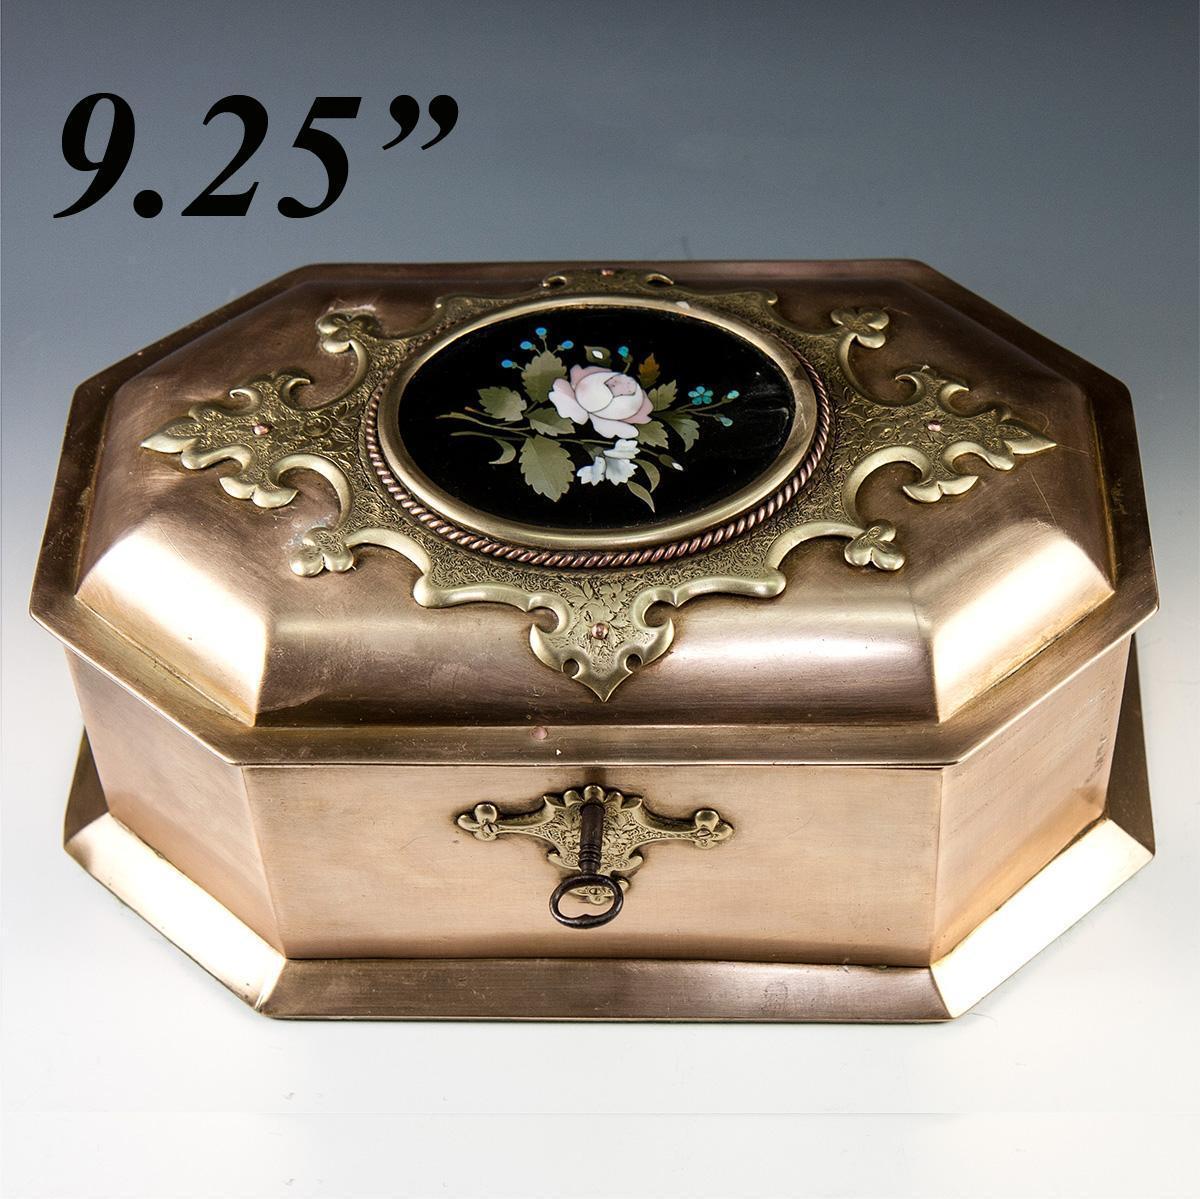 Rare antique heavy italian jewelry box casket for Jewelry box with key